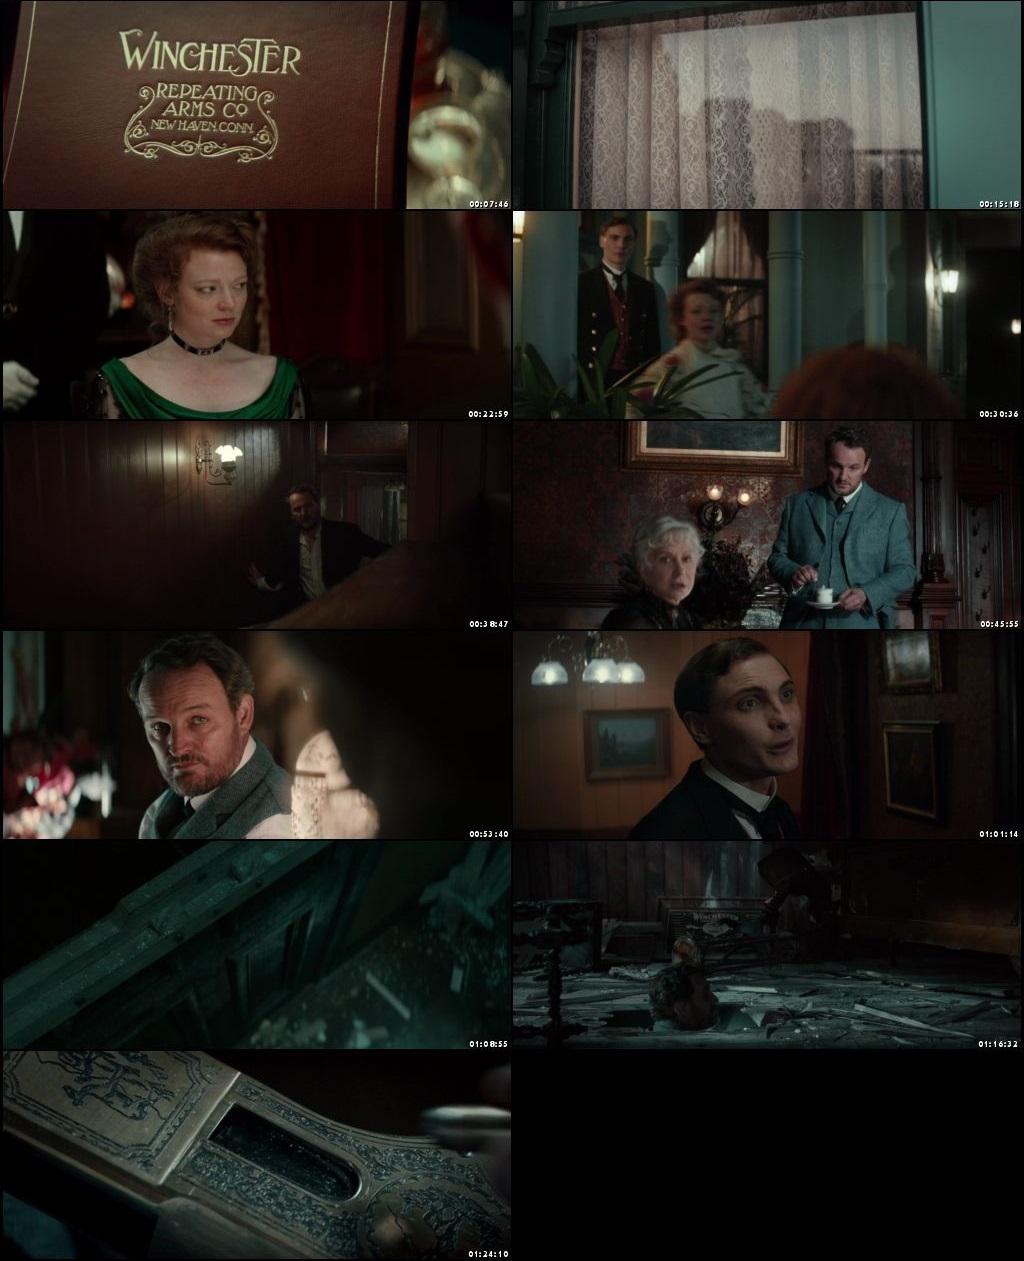 Winchester 2018 Full Movie Download 720p HDRip, BluRay, DVDRip, mkv, Mp4 1080p Full Hd